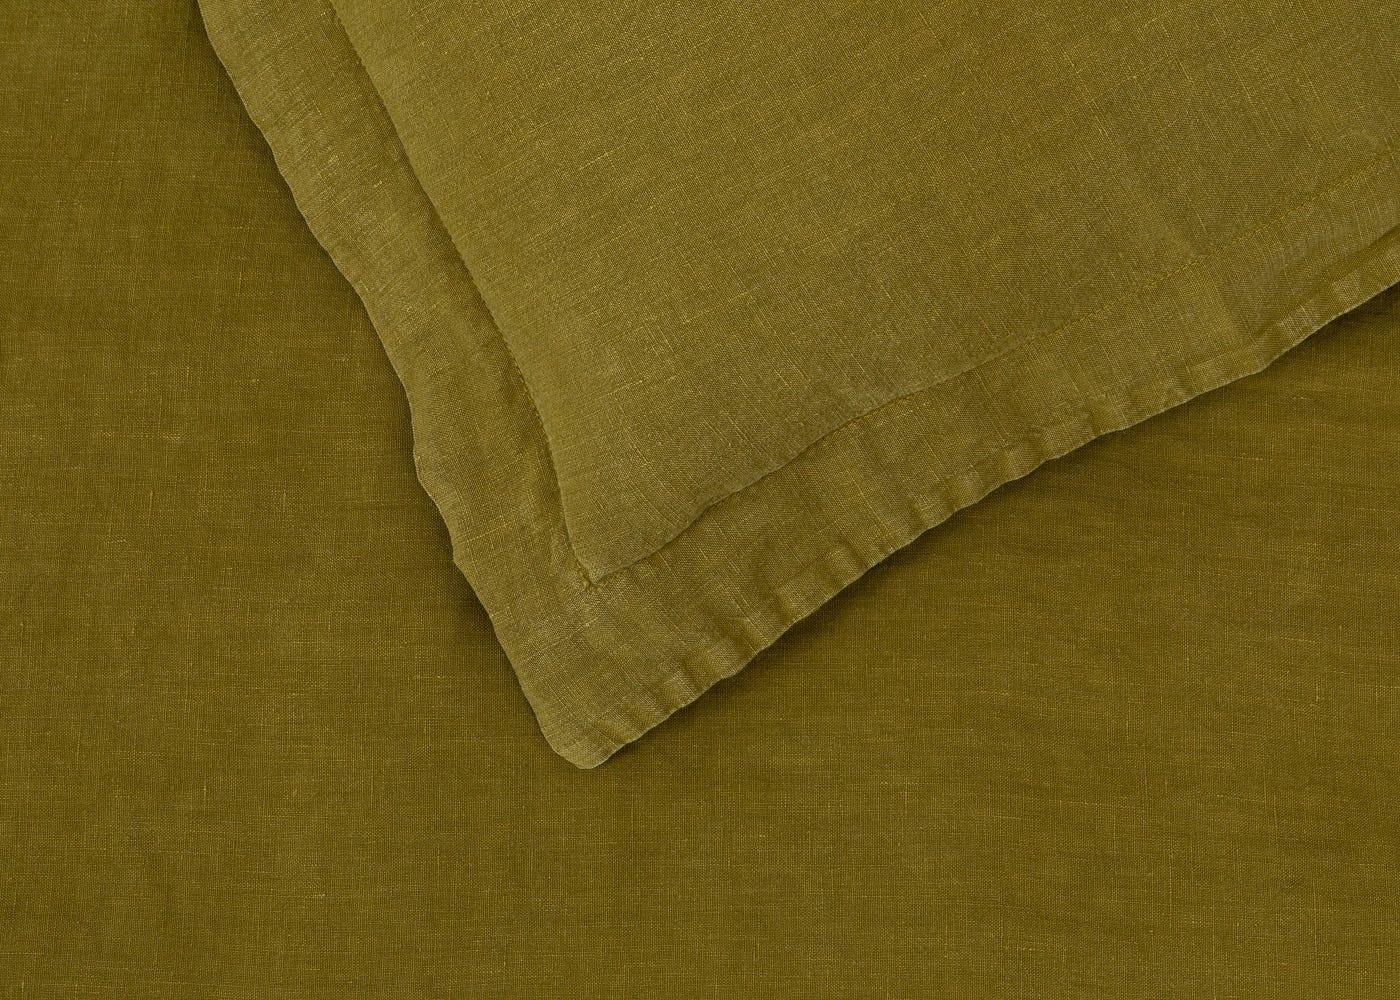 Heal's Washed Linen Olive Duvet Cover King